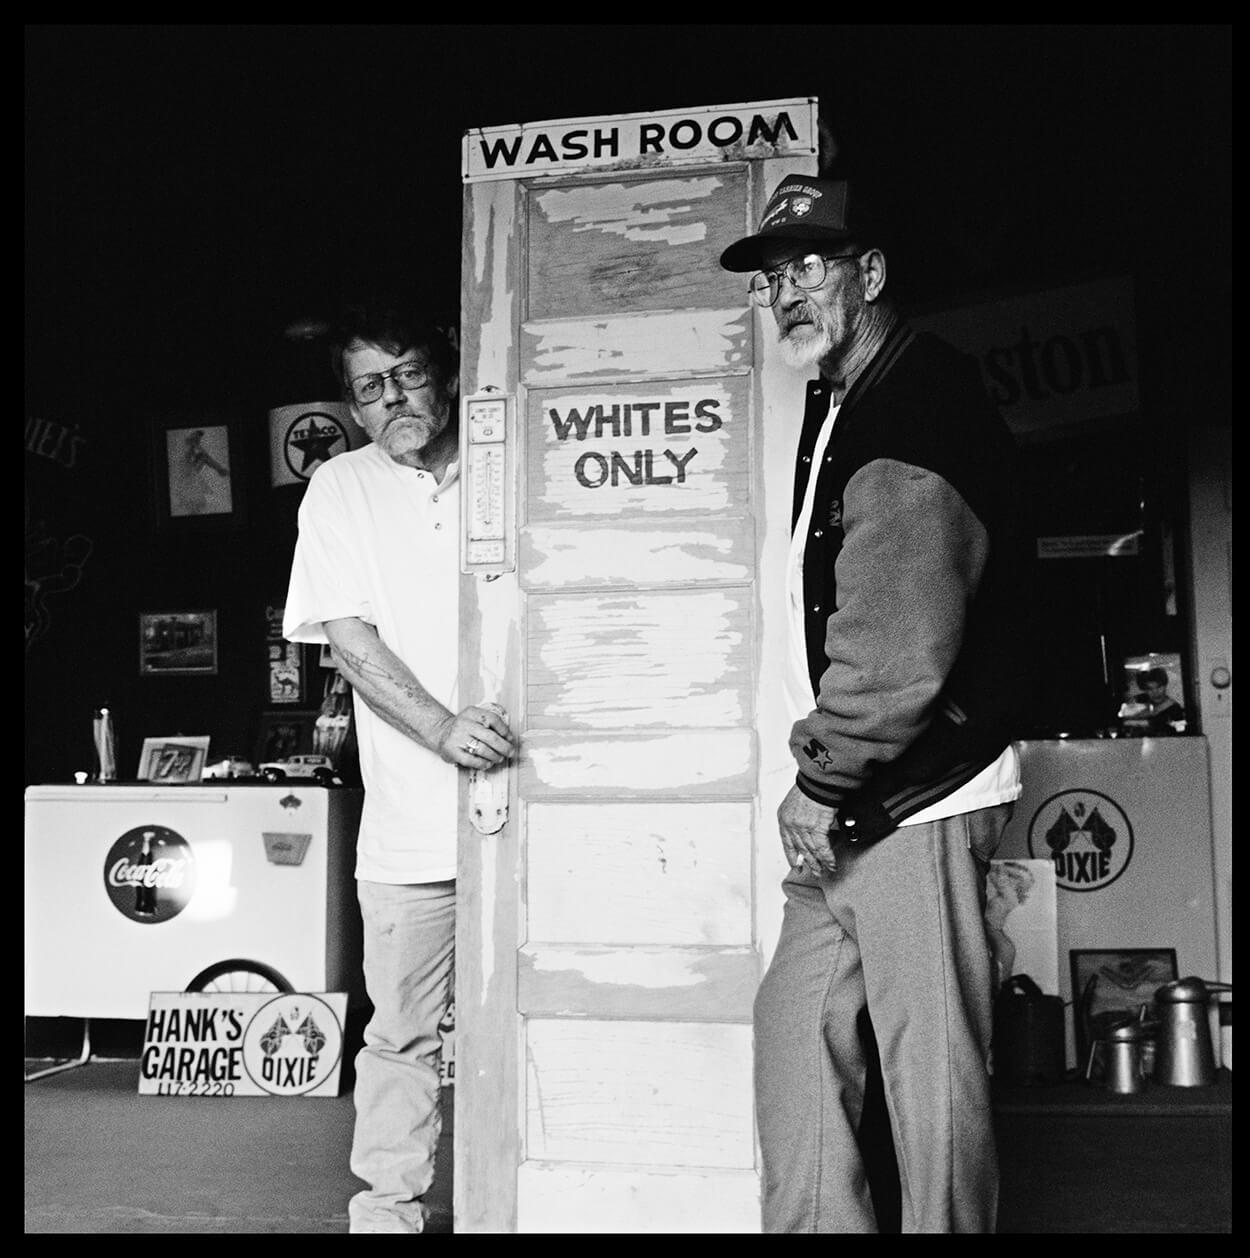 WHITES ONLY - Roadbook - Hunter Barnes Photography